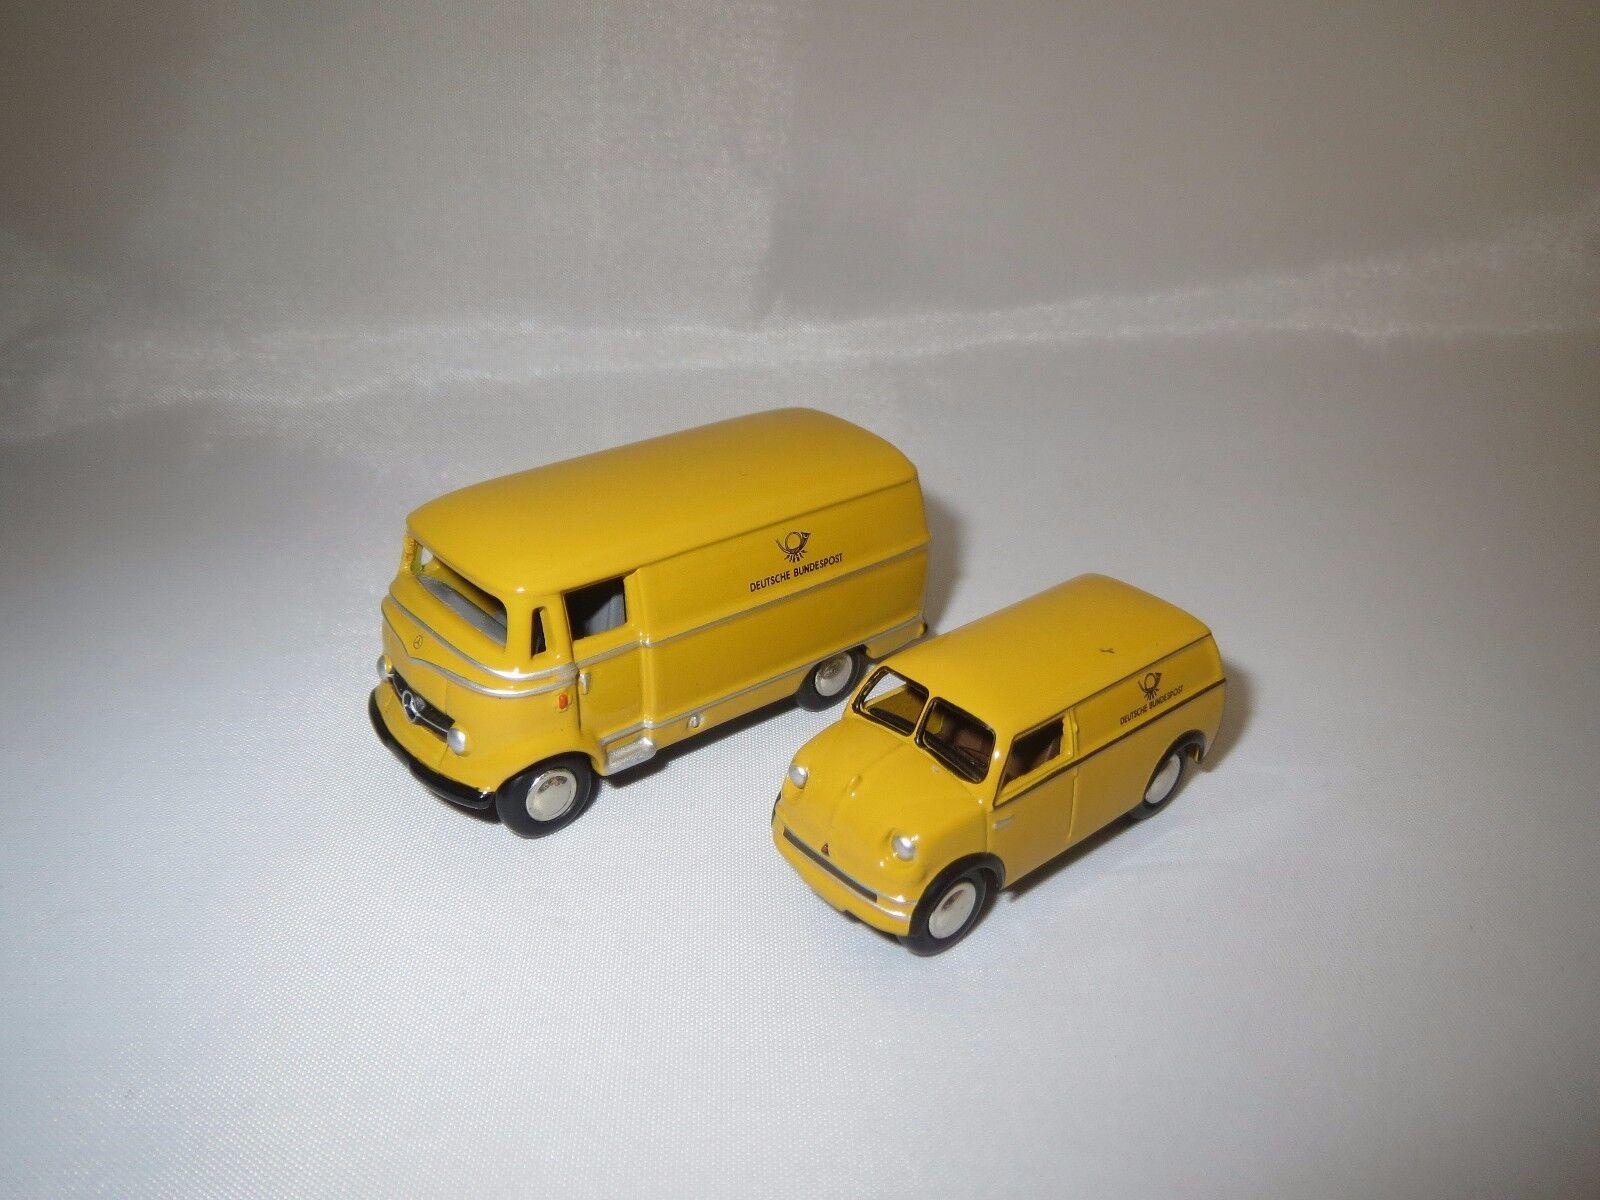 Bouèbe 010636 Mercedes-Benz l319 et Lloyd LT 500  DEUTSCHE POST  1 87 NEUF dans sa boîte